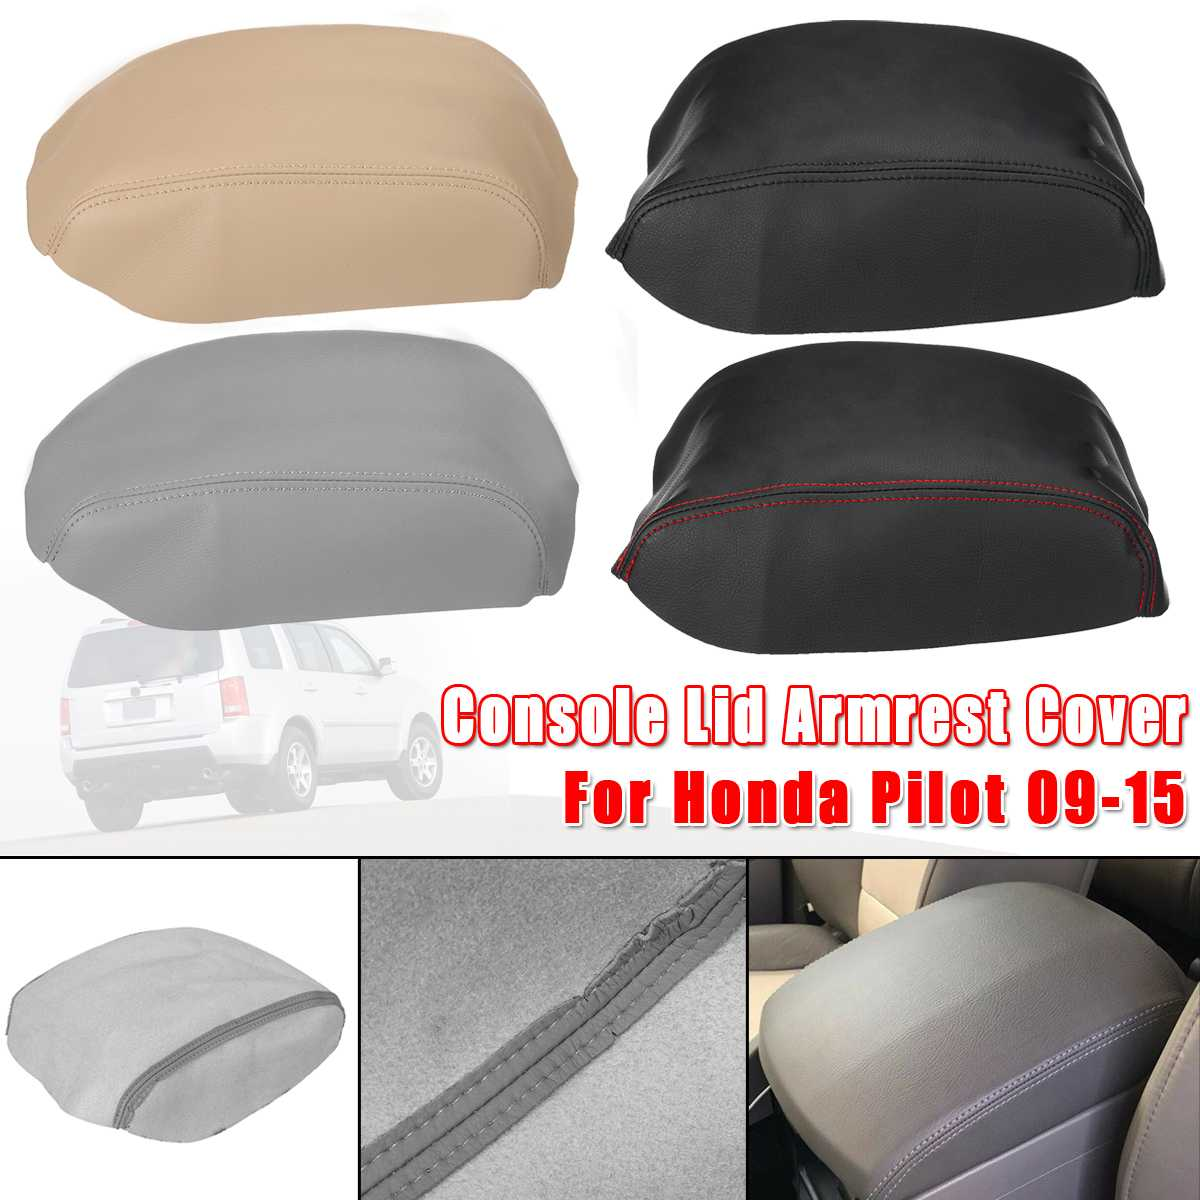 Car Microfiber Armrest Cover Center Console Lid Armrest Cover Pad For Honda for Pilot 2009 2010 2011 2012 2013 2014 2015 Black